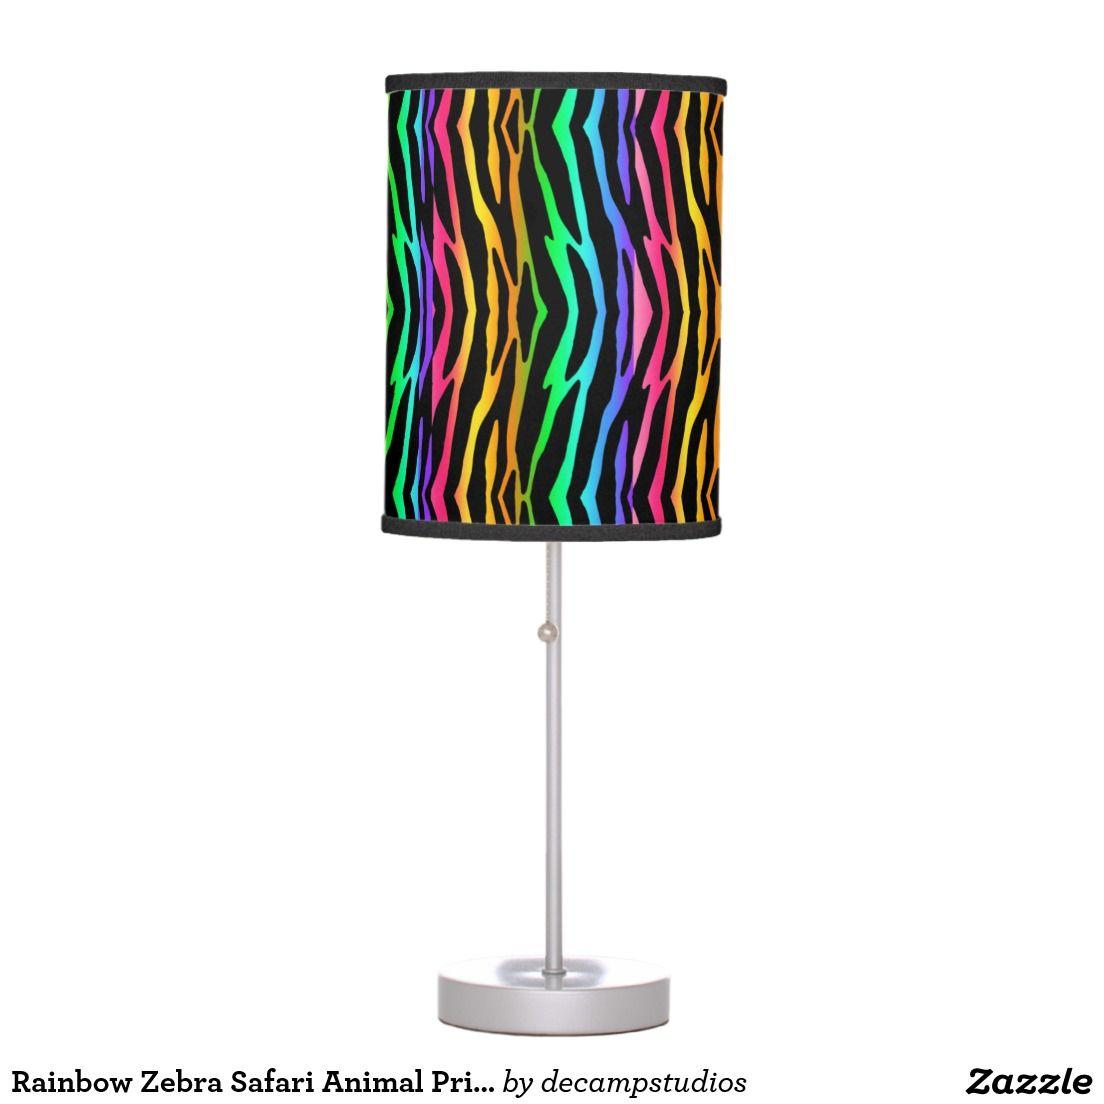 rainbow zebra safari animal print desk lamp rainbow zebra rainbow zebra safari animal print desk lamp